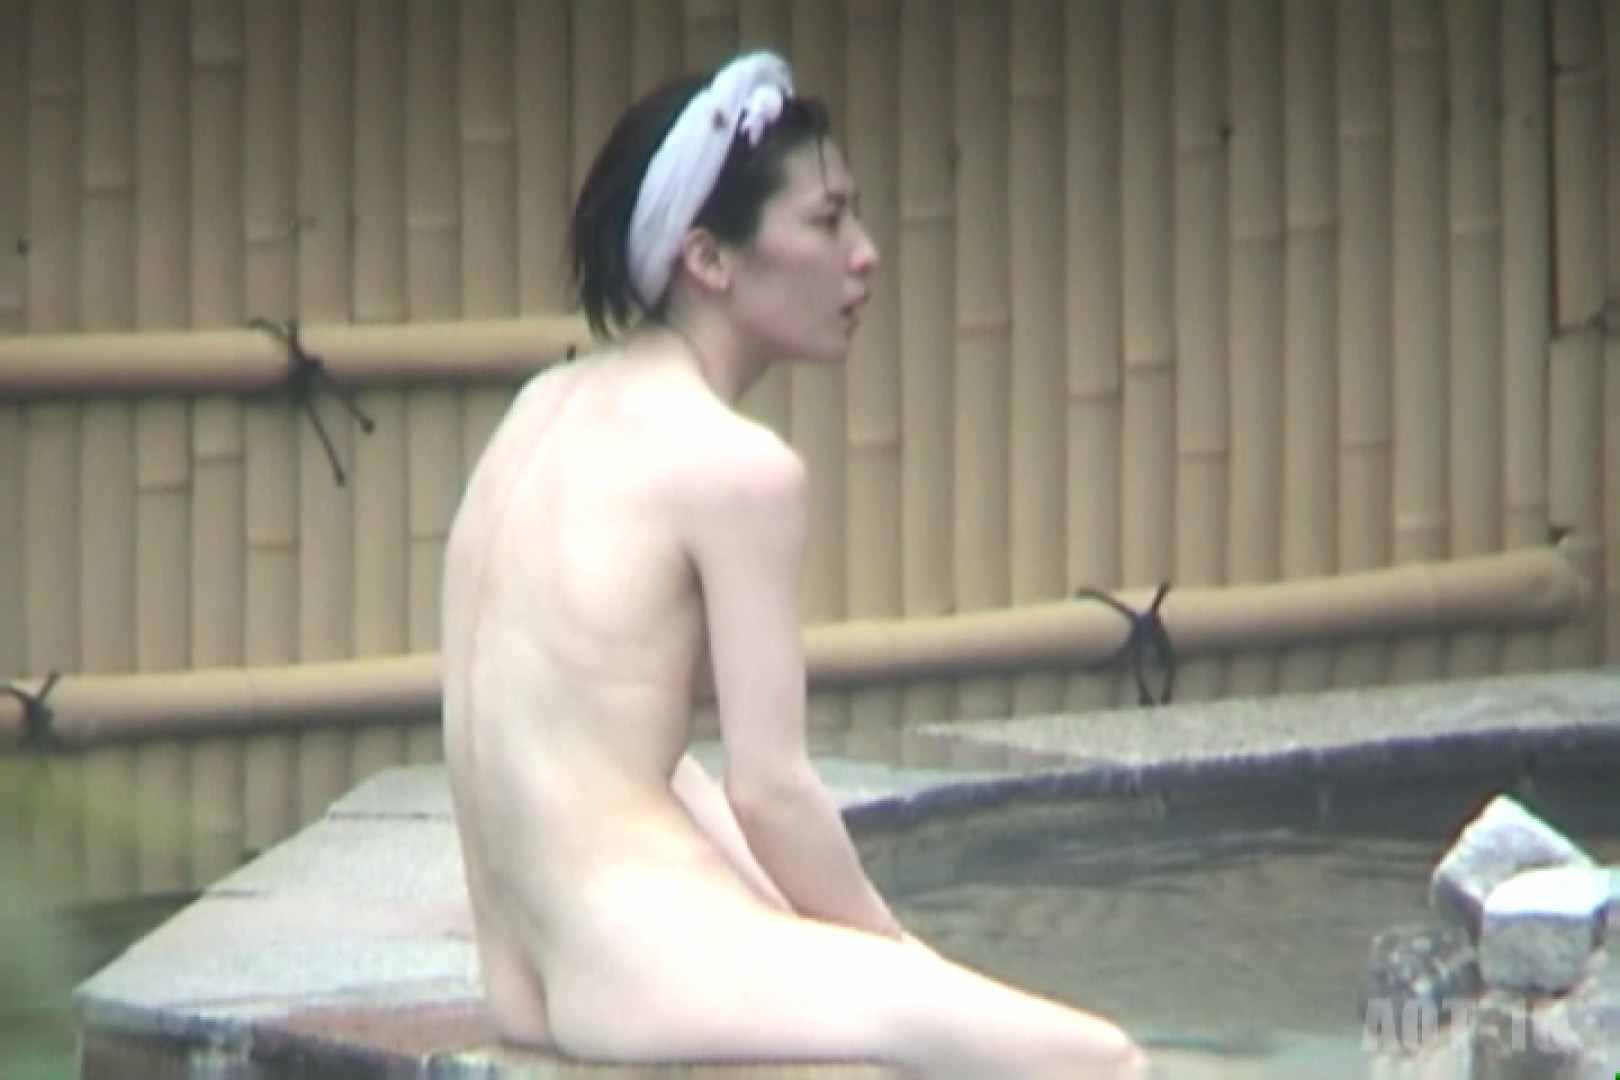 Aquaな露天風呂Vol.793 盗撮映像  72Pix 50